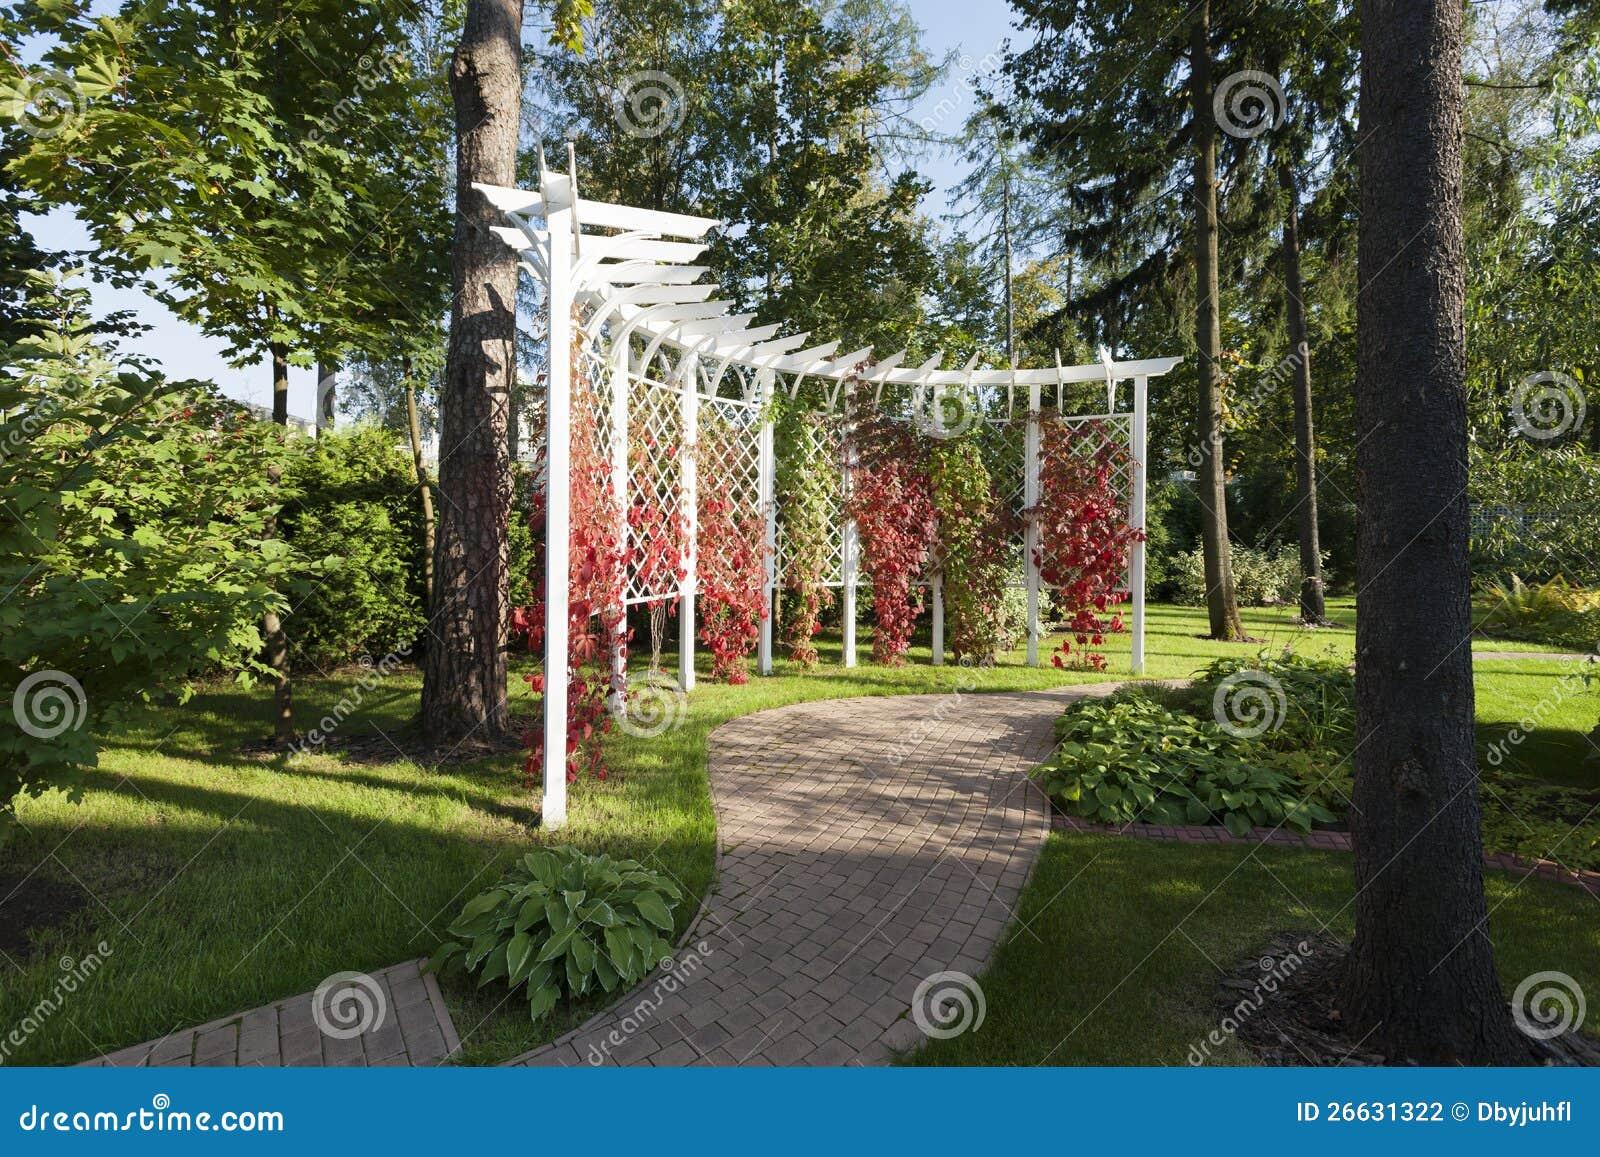 De tuin van de pergola stock fotografie afbeelding 26631322 - Omslag van pergola ...